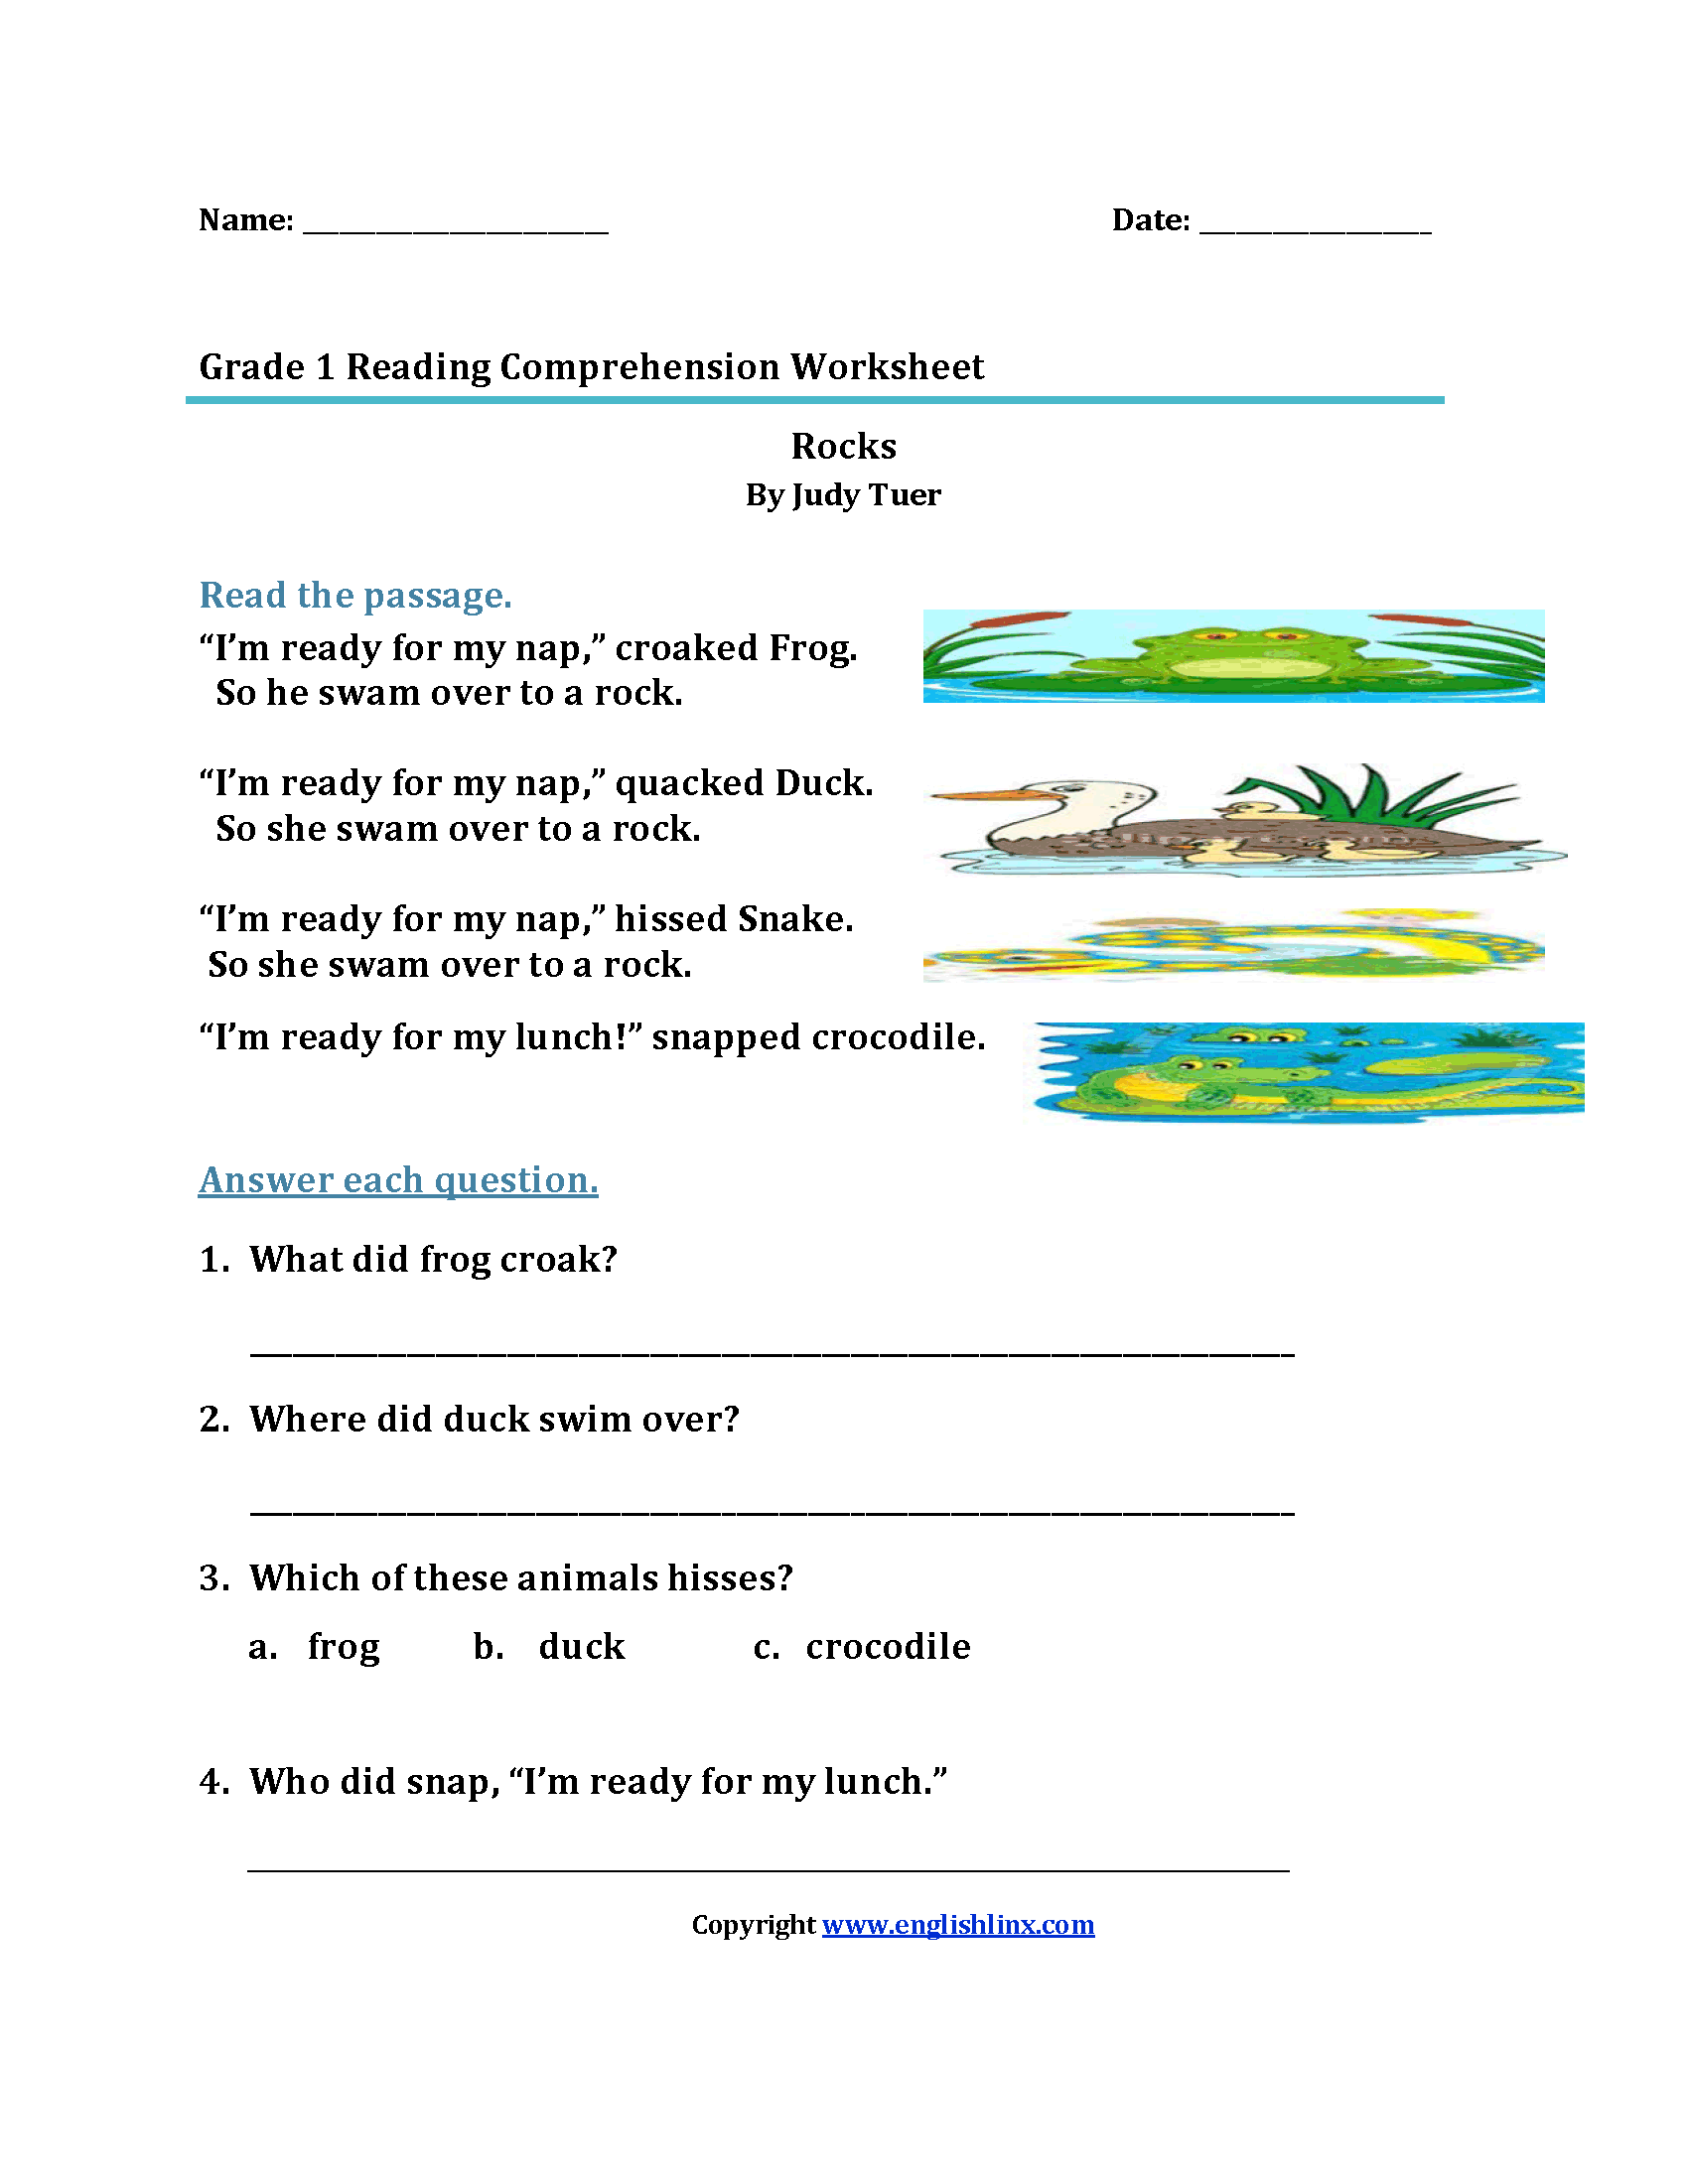 Rocks First Grade Reading Worksheets